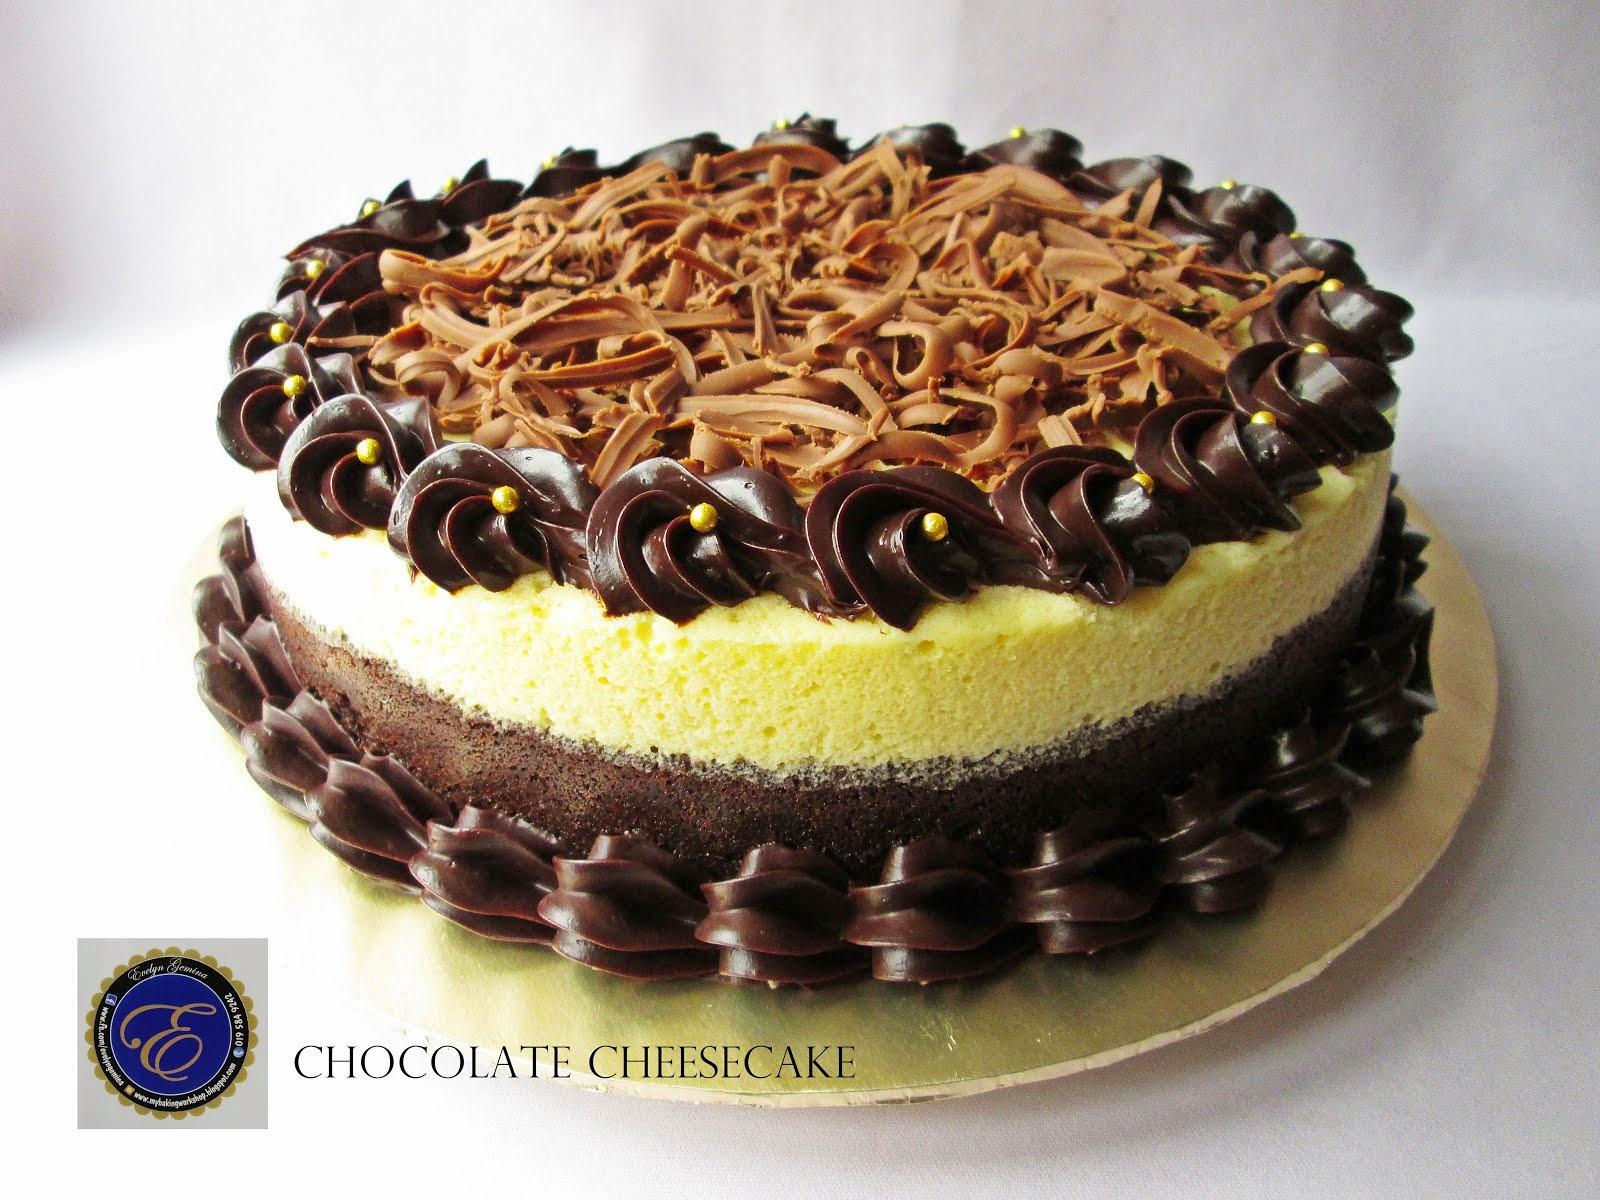 Chocolate Cheesecake / 1.2kg